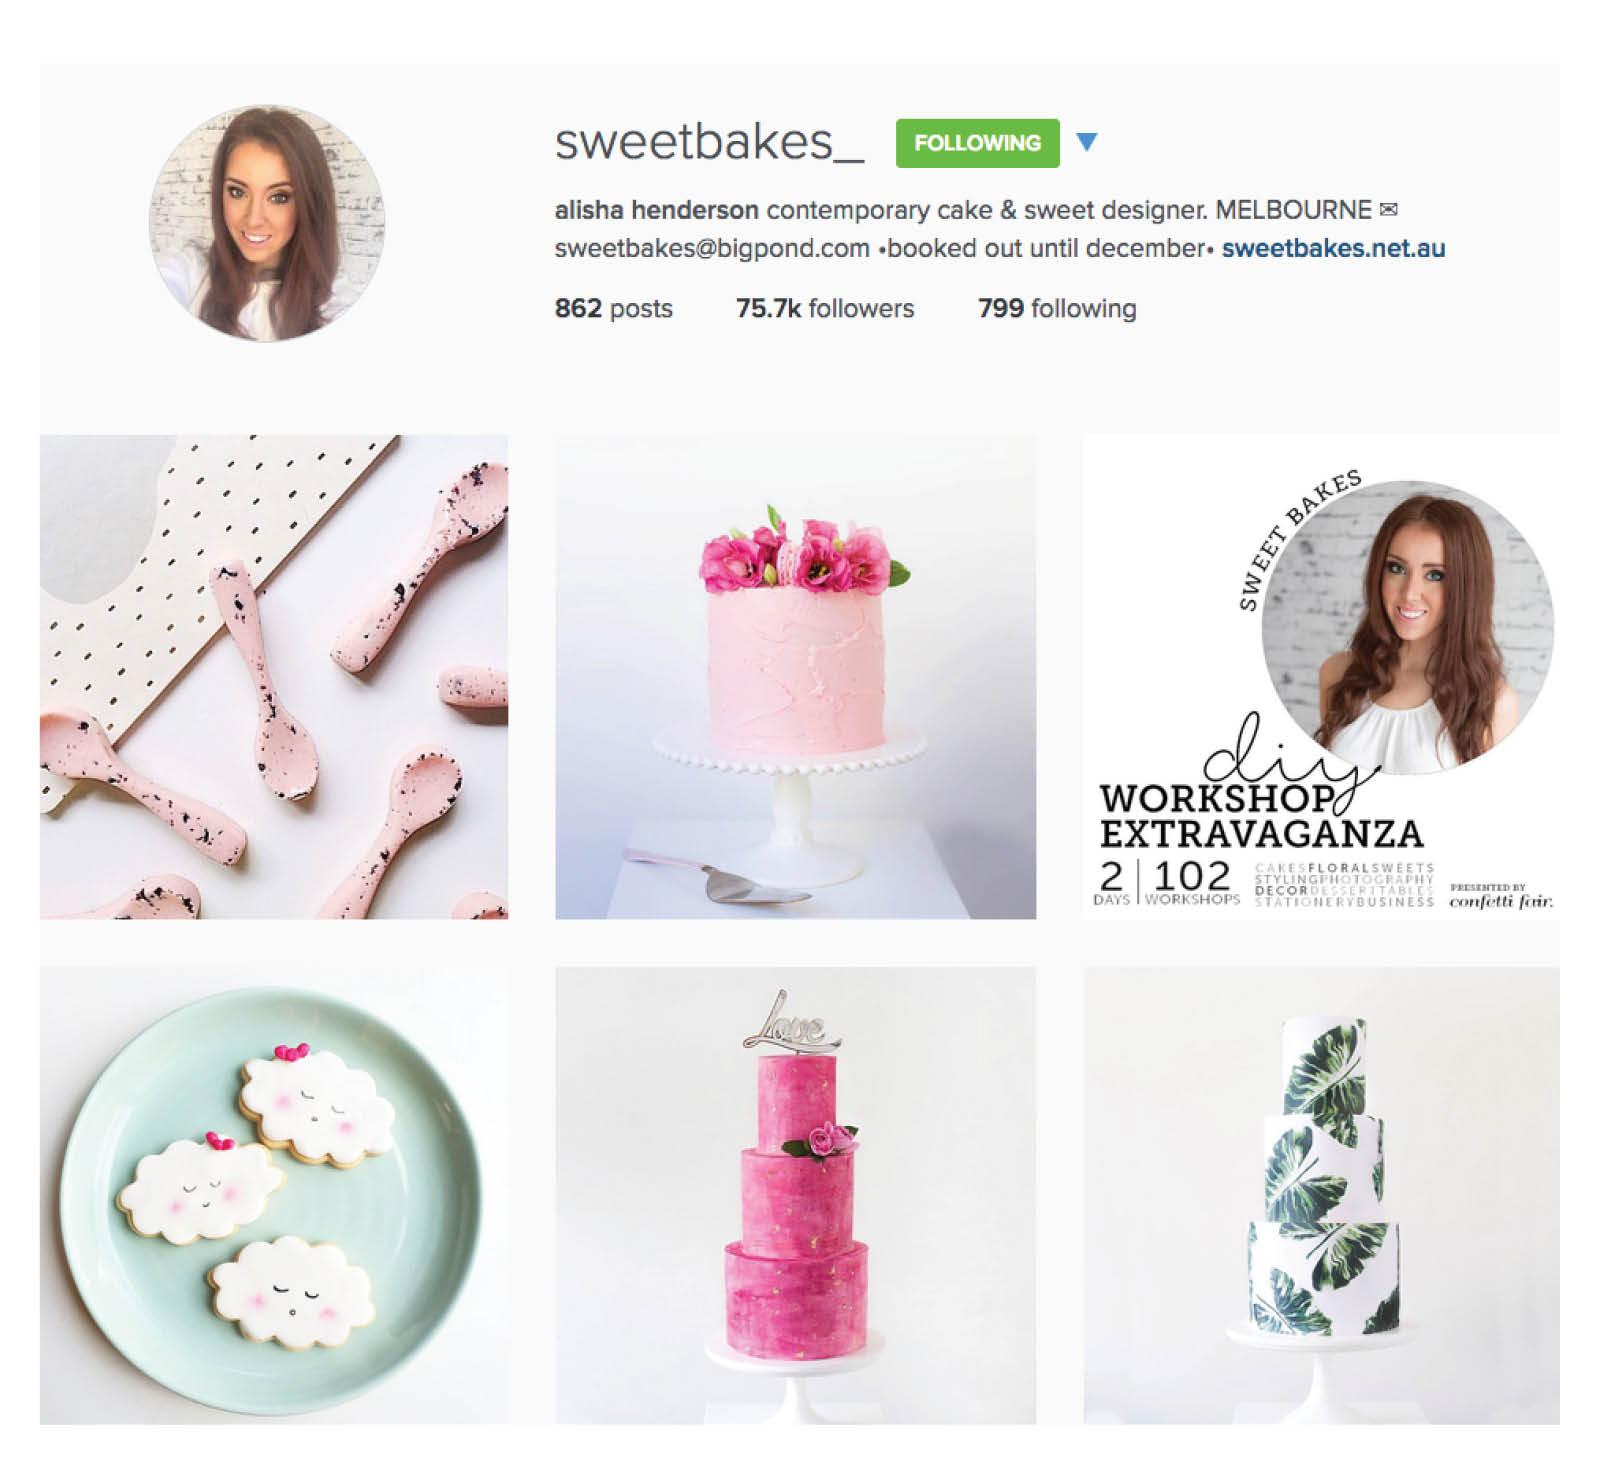 Sweet bakes wedding cake instagram